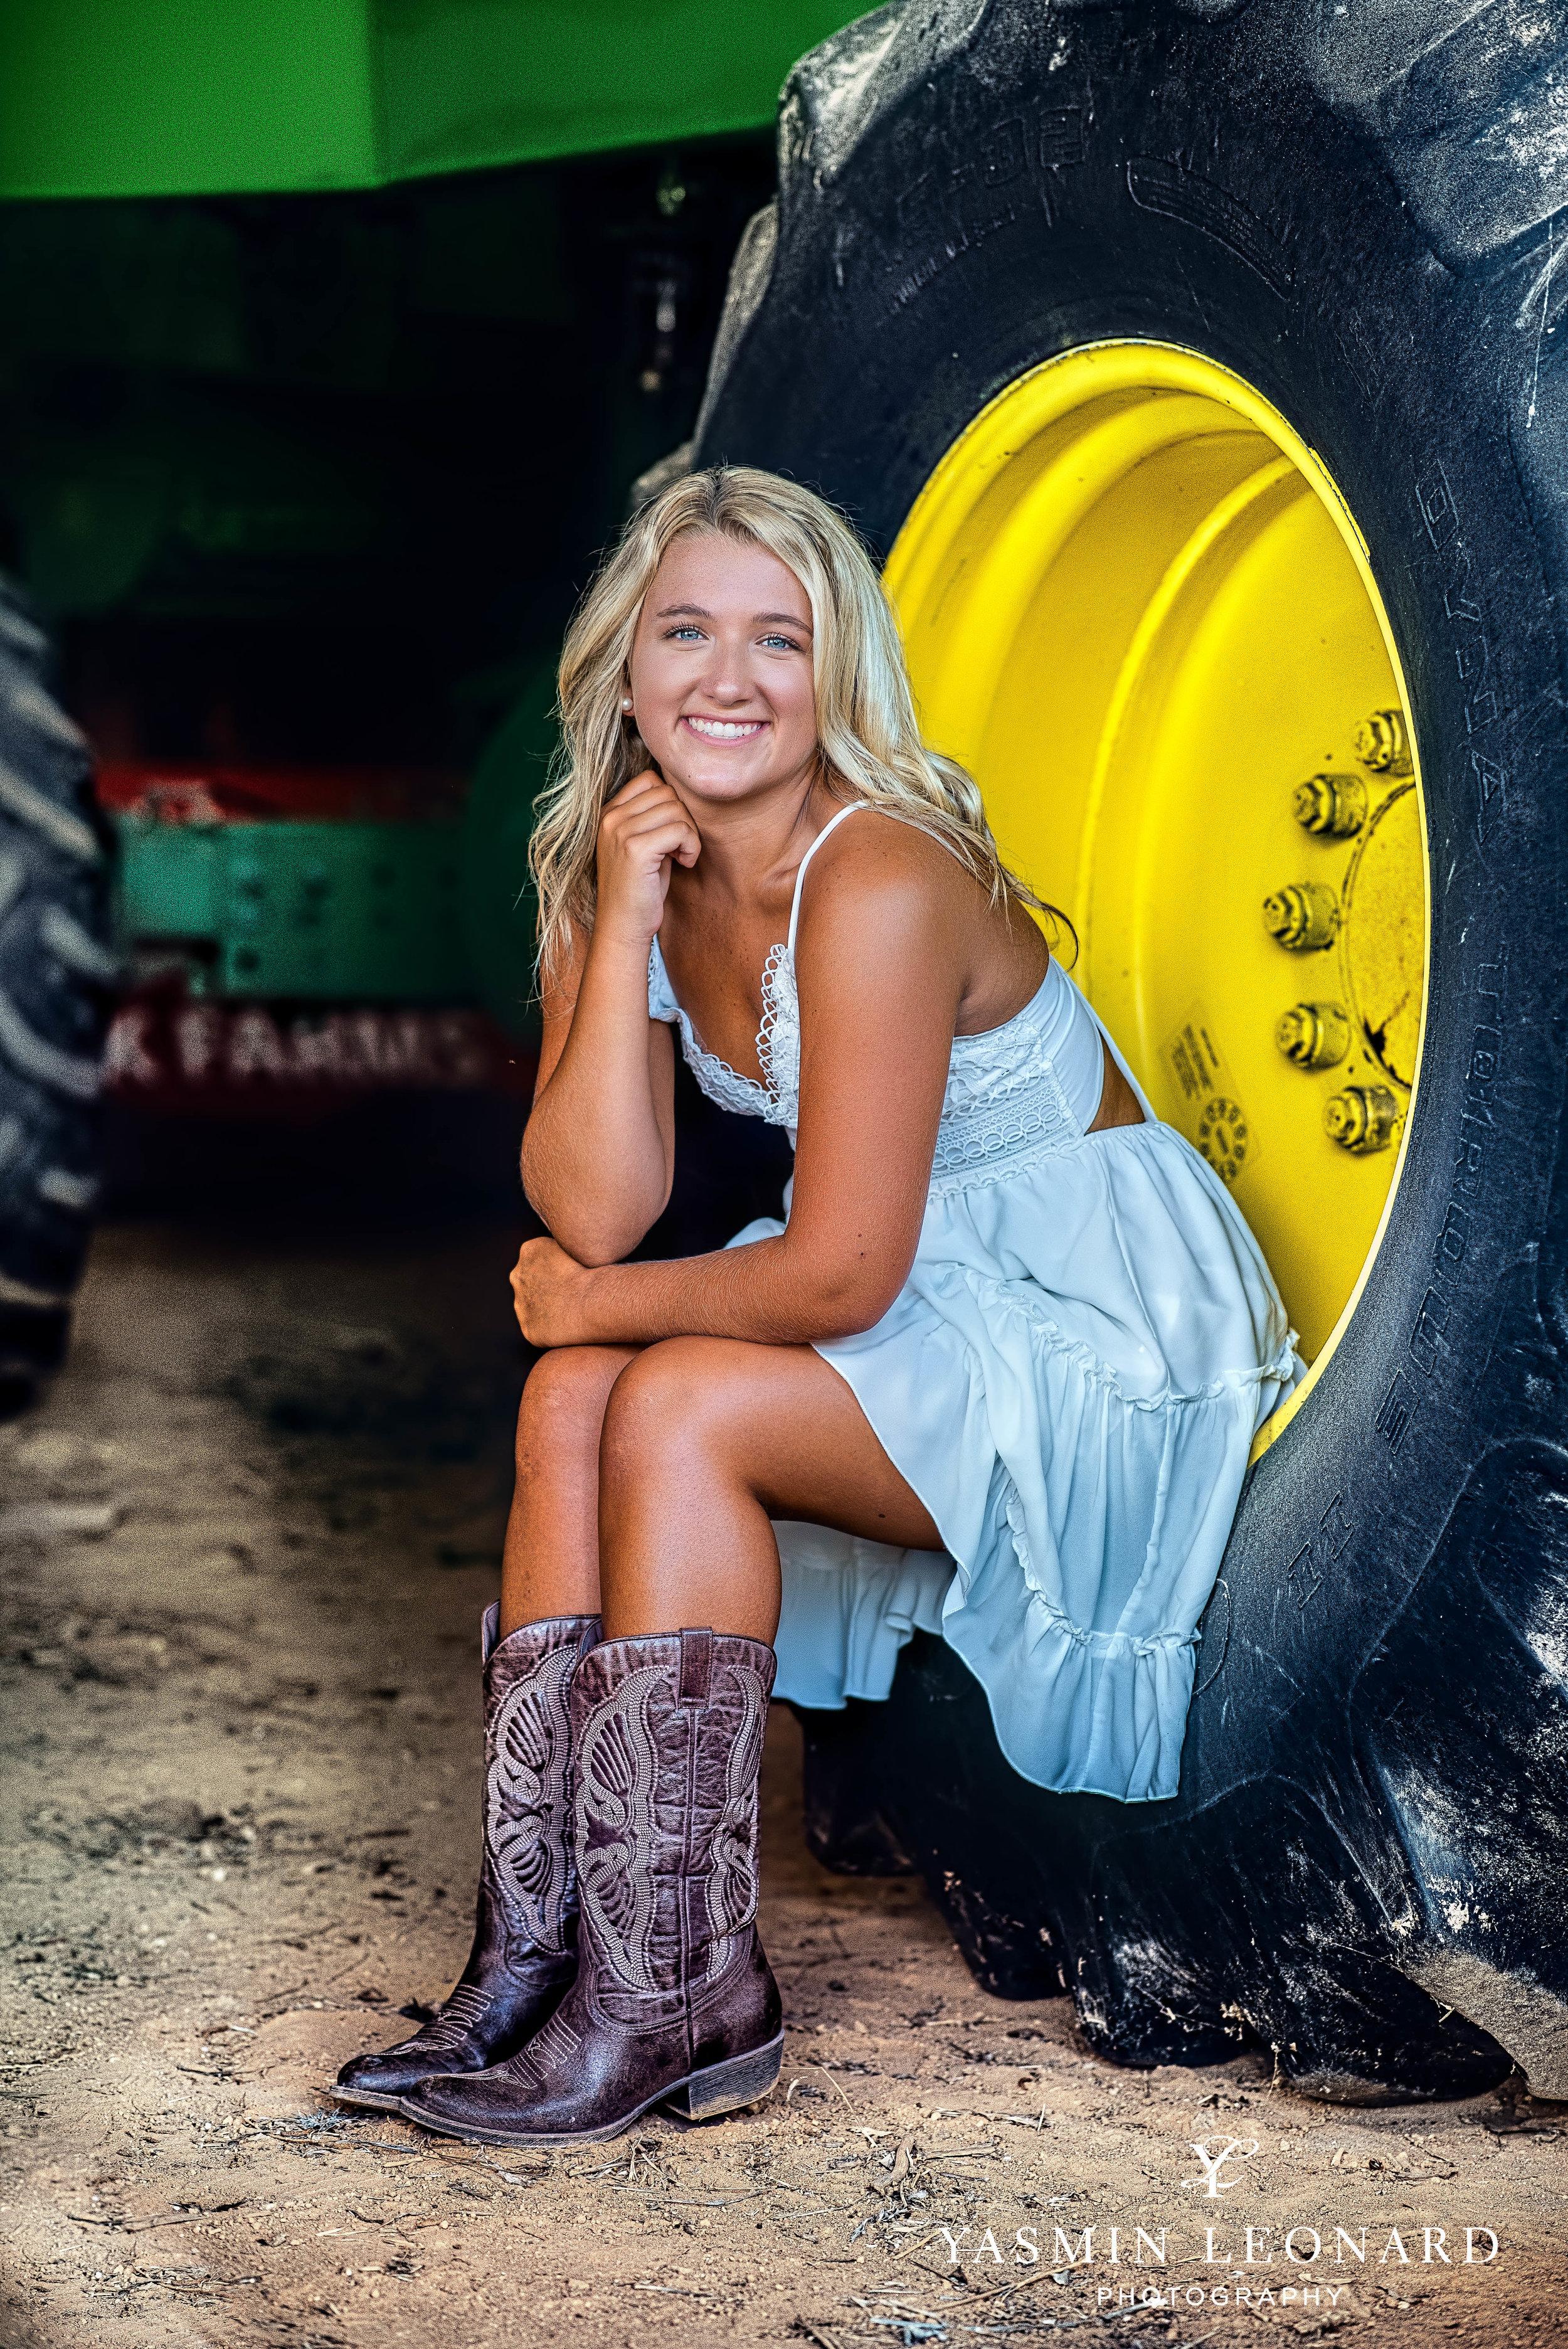 Senior Poses - Girl Senior Poses - Country Senior - Tractor with Senior - Tanglewood Senoir Portratis - Summer Senior Portrait Outfits - Yasmin Leonard PHotography-1.jpg